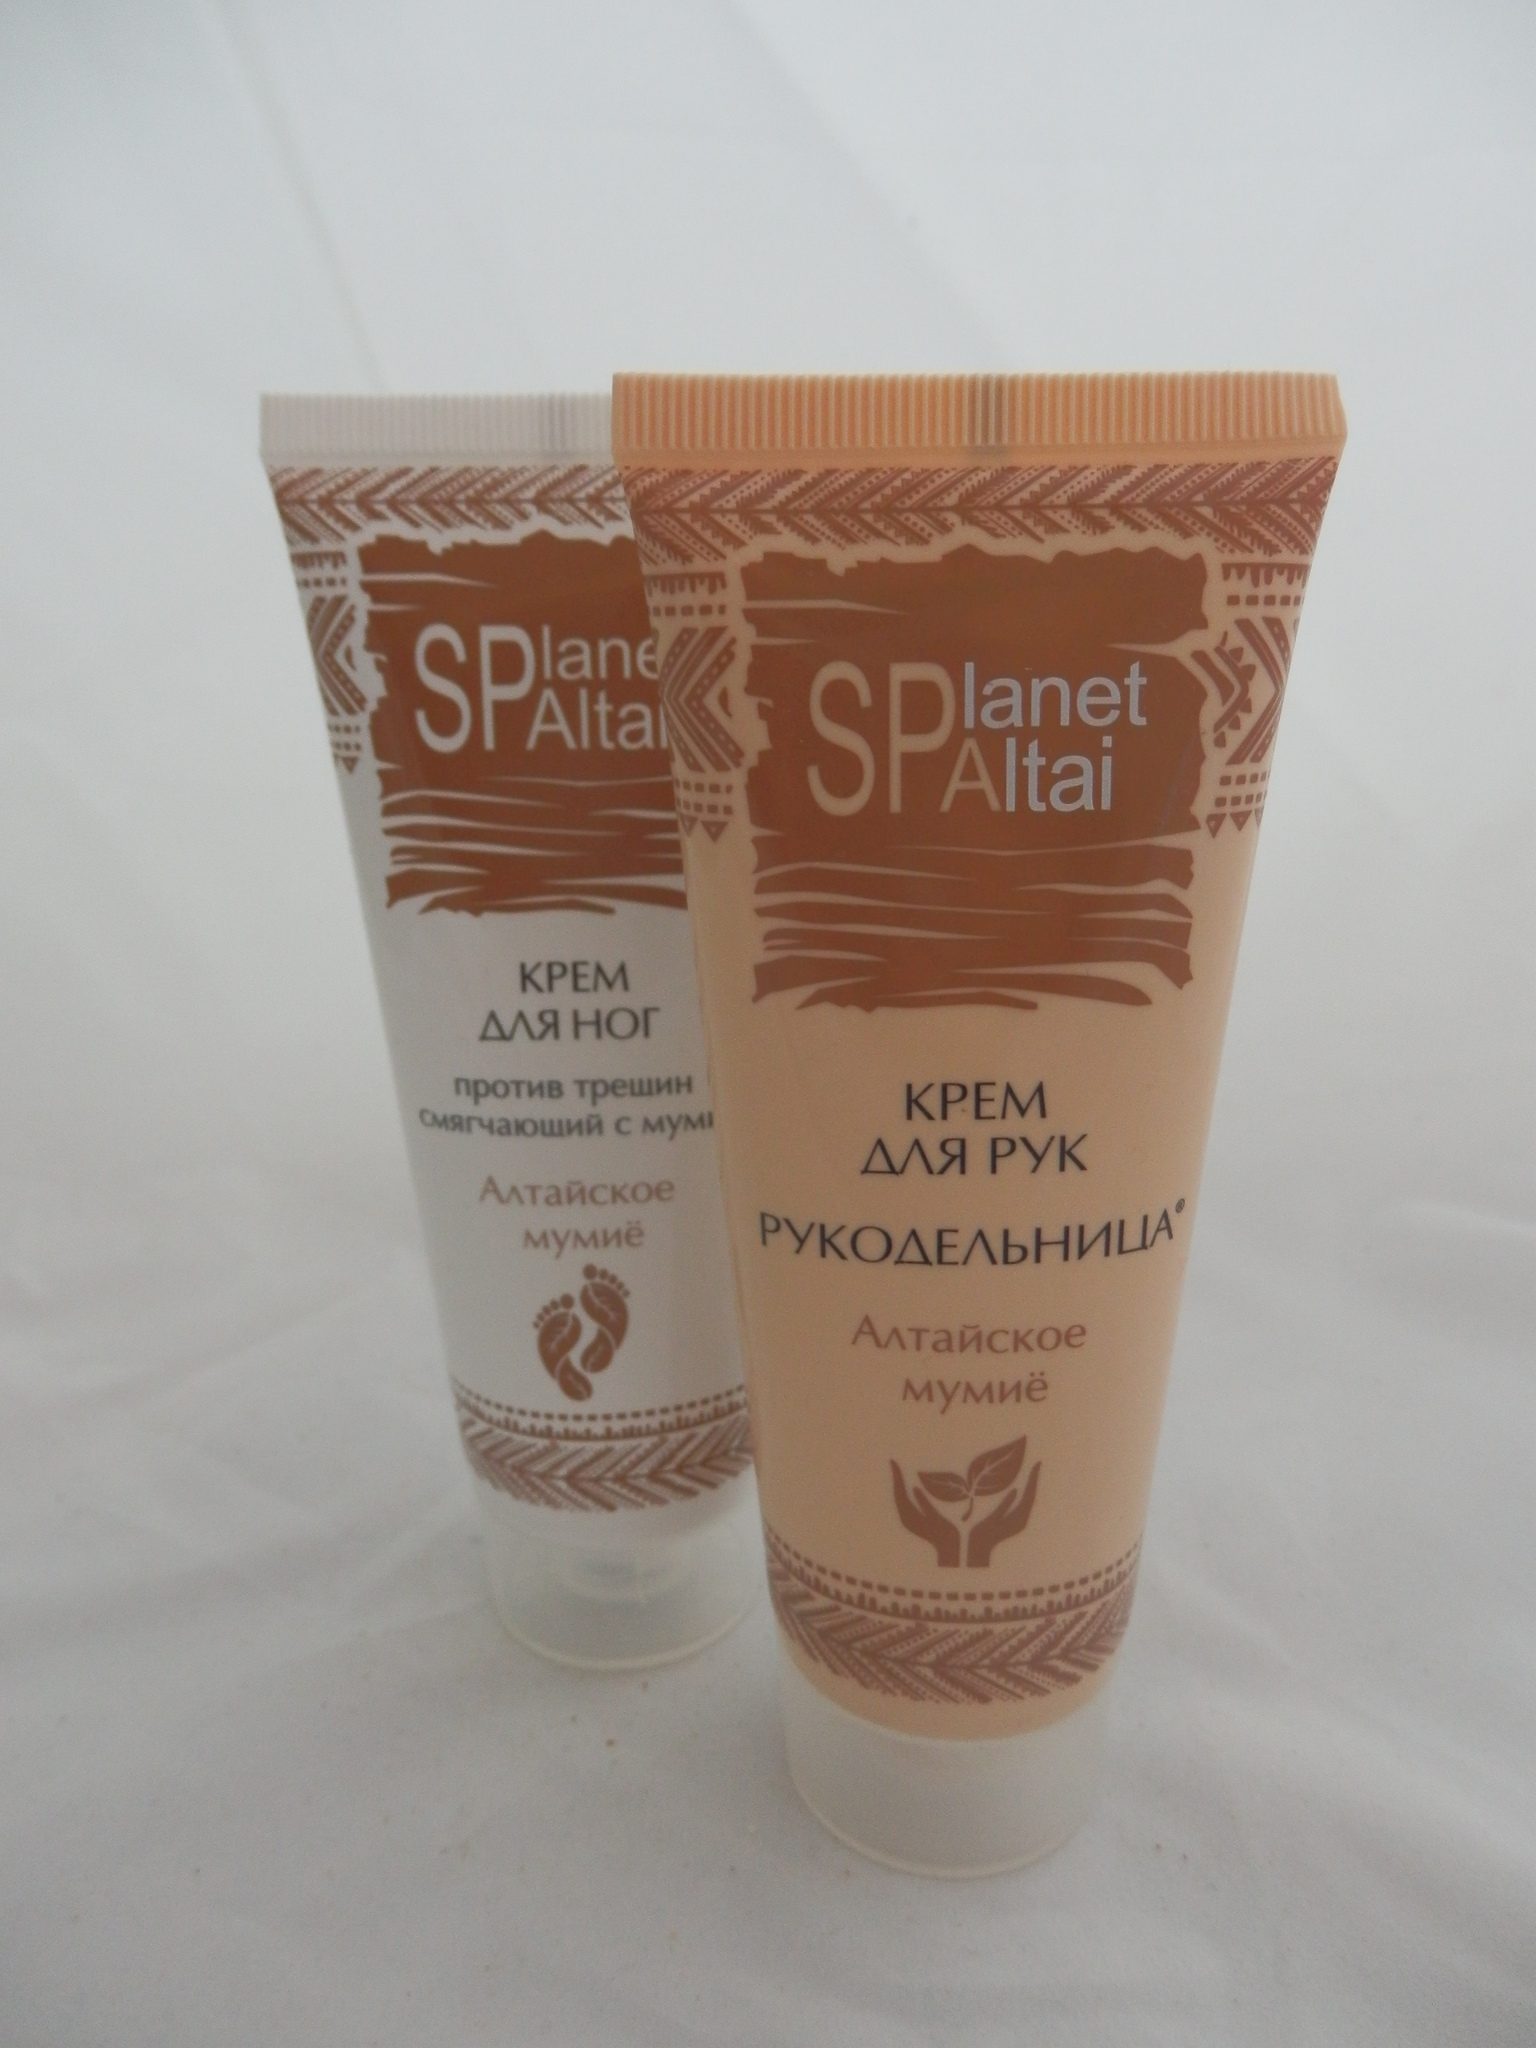 Planet SPA Altai Крем для рук с мумиё Рукодельница